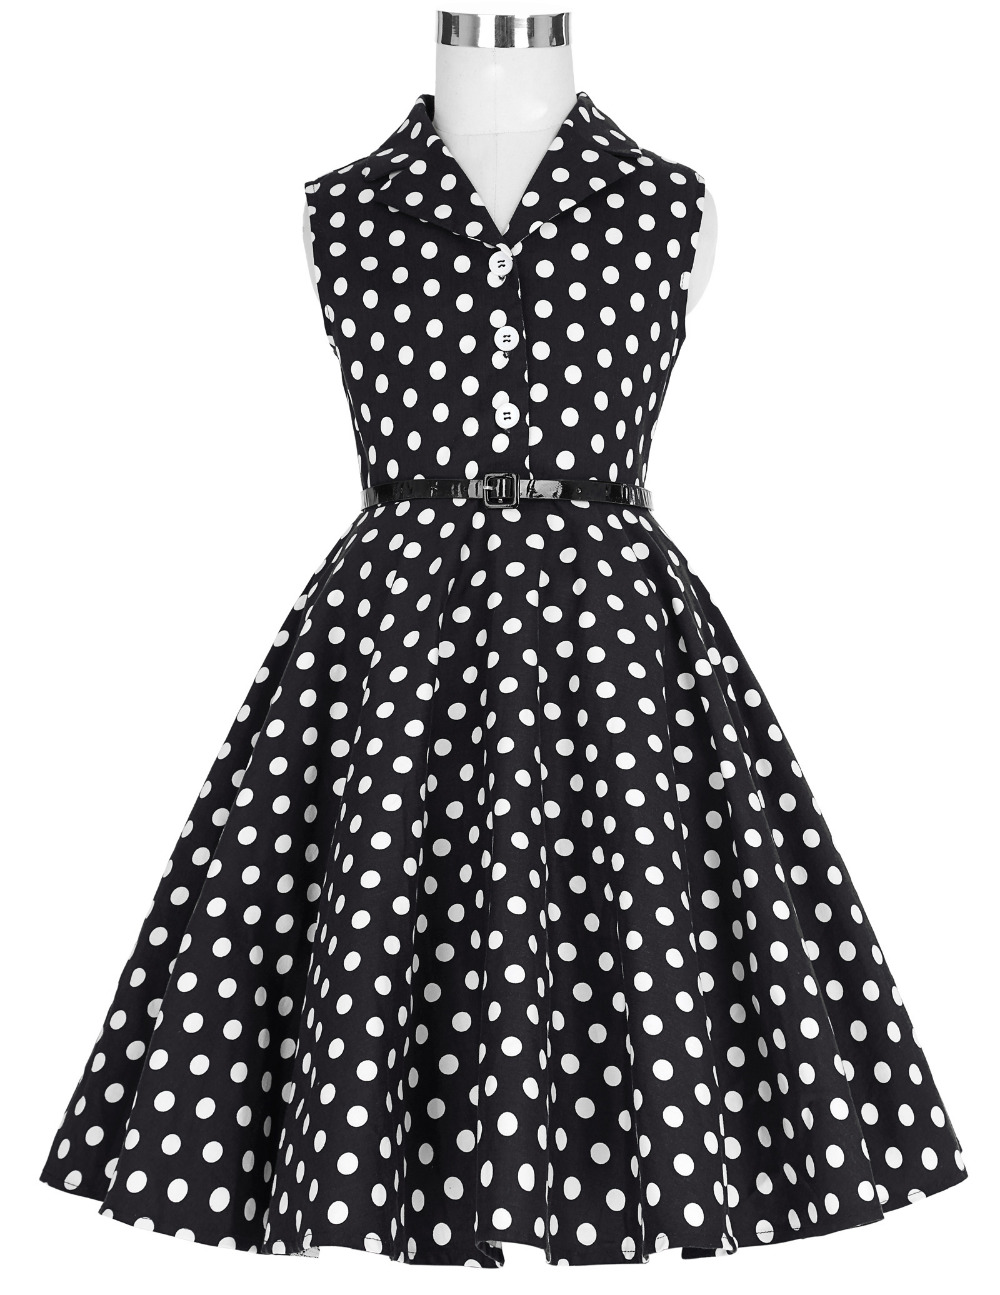 Grace Karin Flower Girl Dresses for Weddings 2017 Sleeveless Polka Dots Printed Vintage Pin Up Style Children's Clothing 5